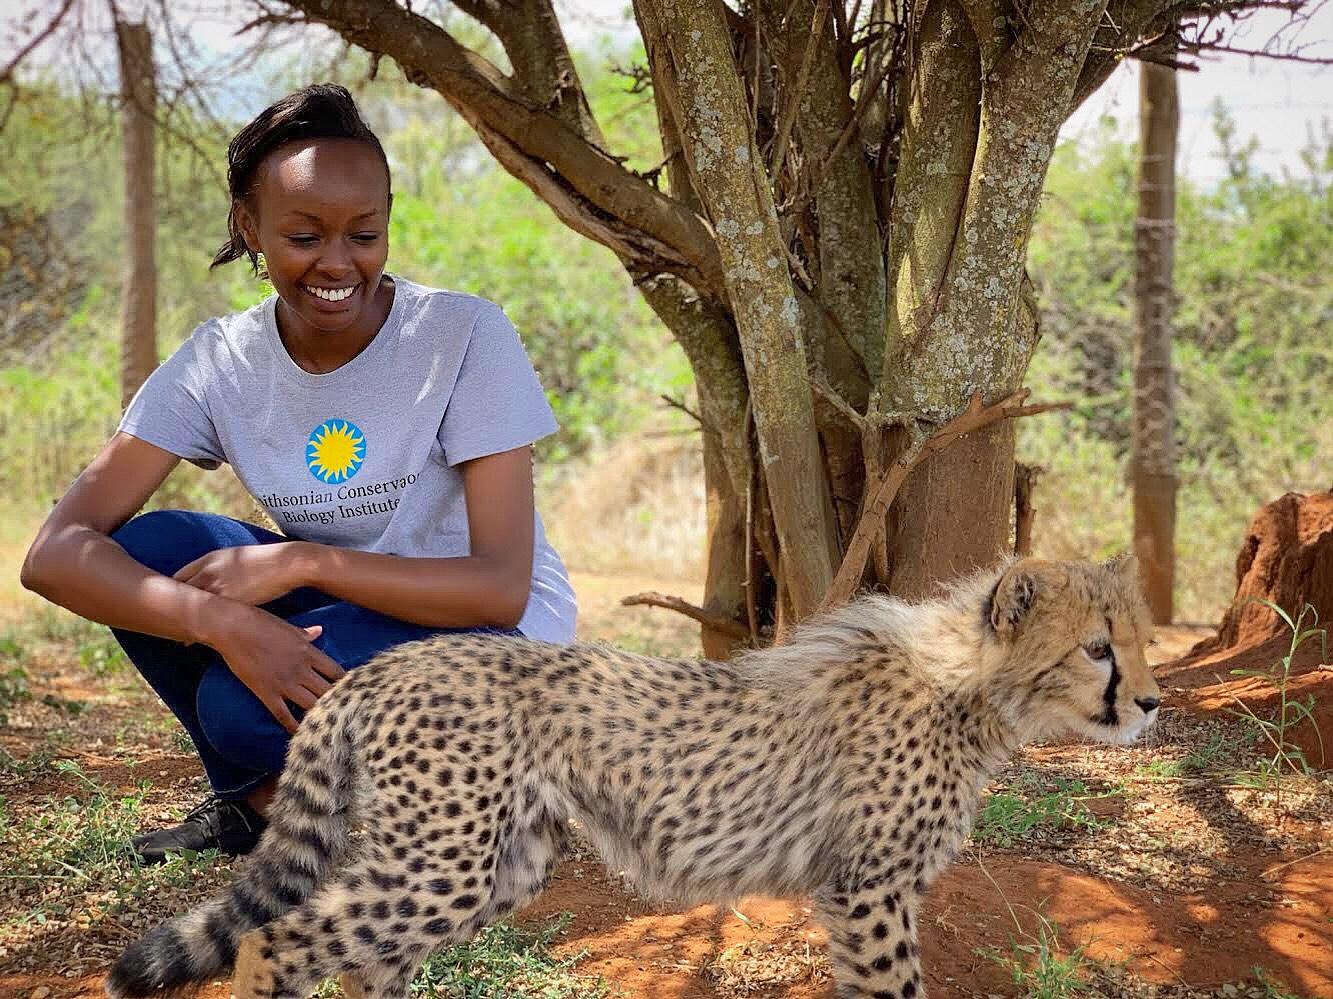 A Global Health Program veterinary fellow kneels near a young cheetah